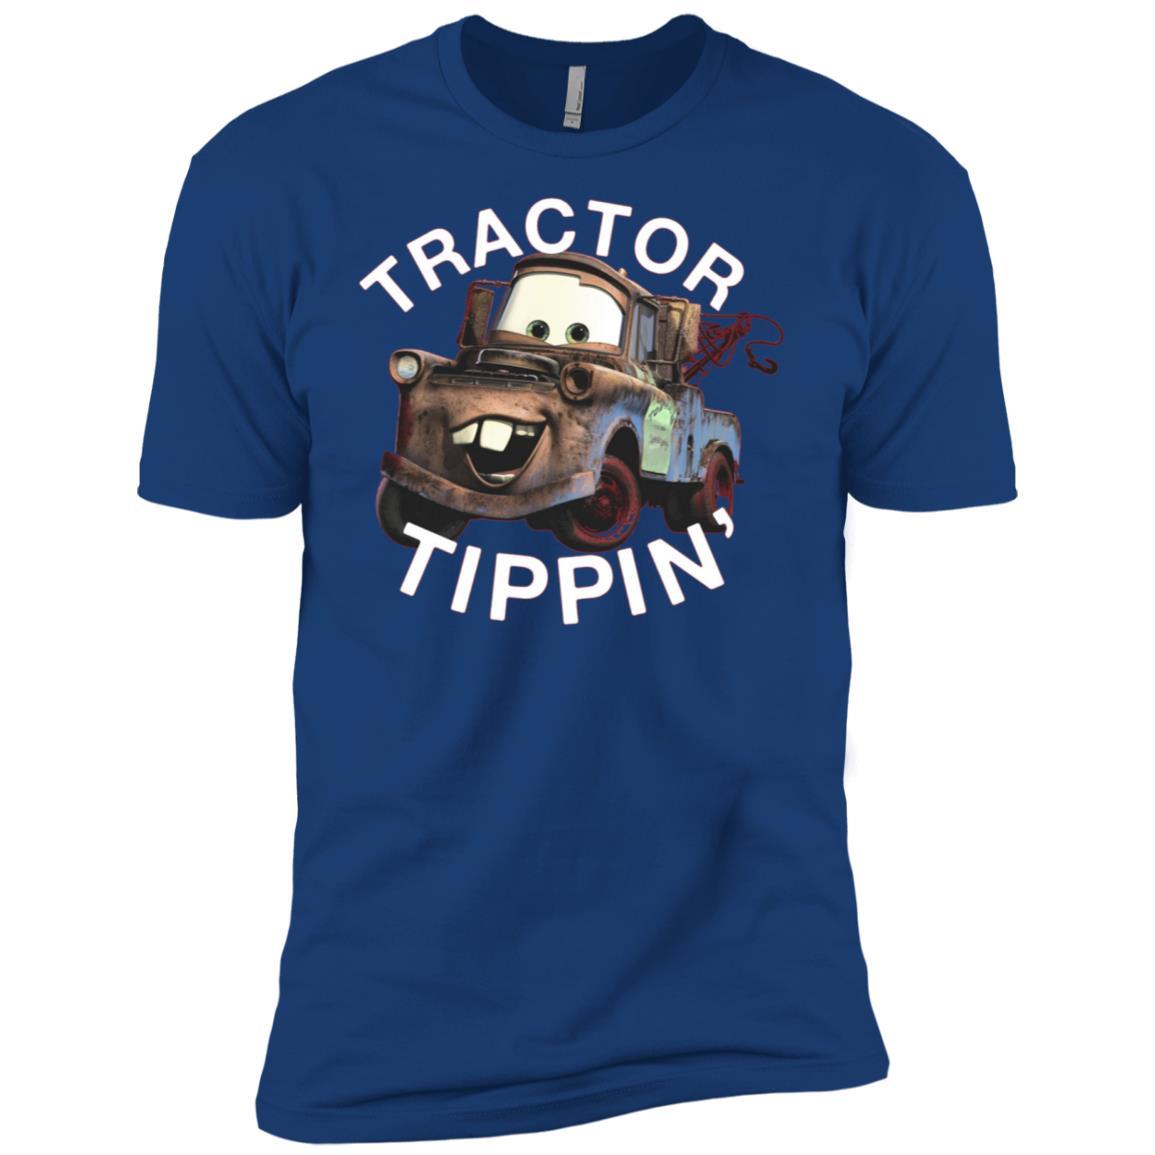 Disney Pixars Cars 3 Mater Tractor Tippin' Graphic Men Short Sleeve T-Shirt